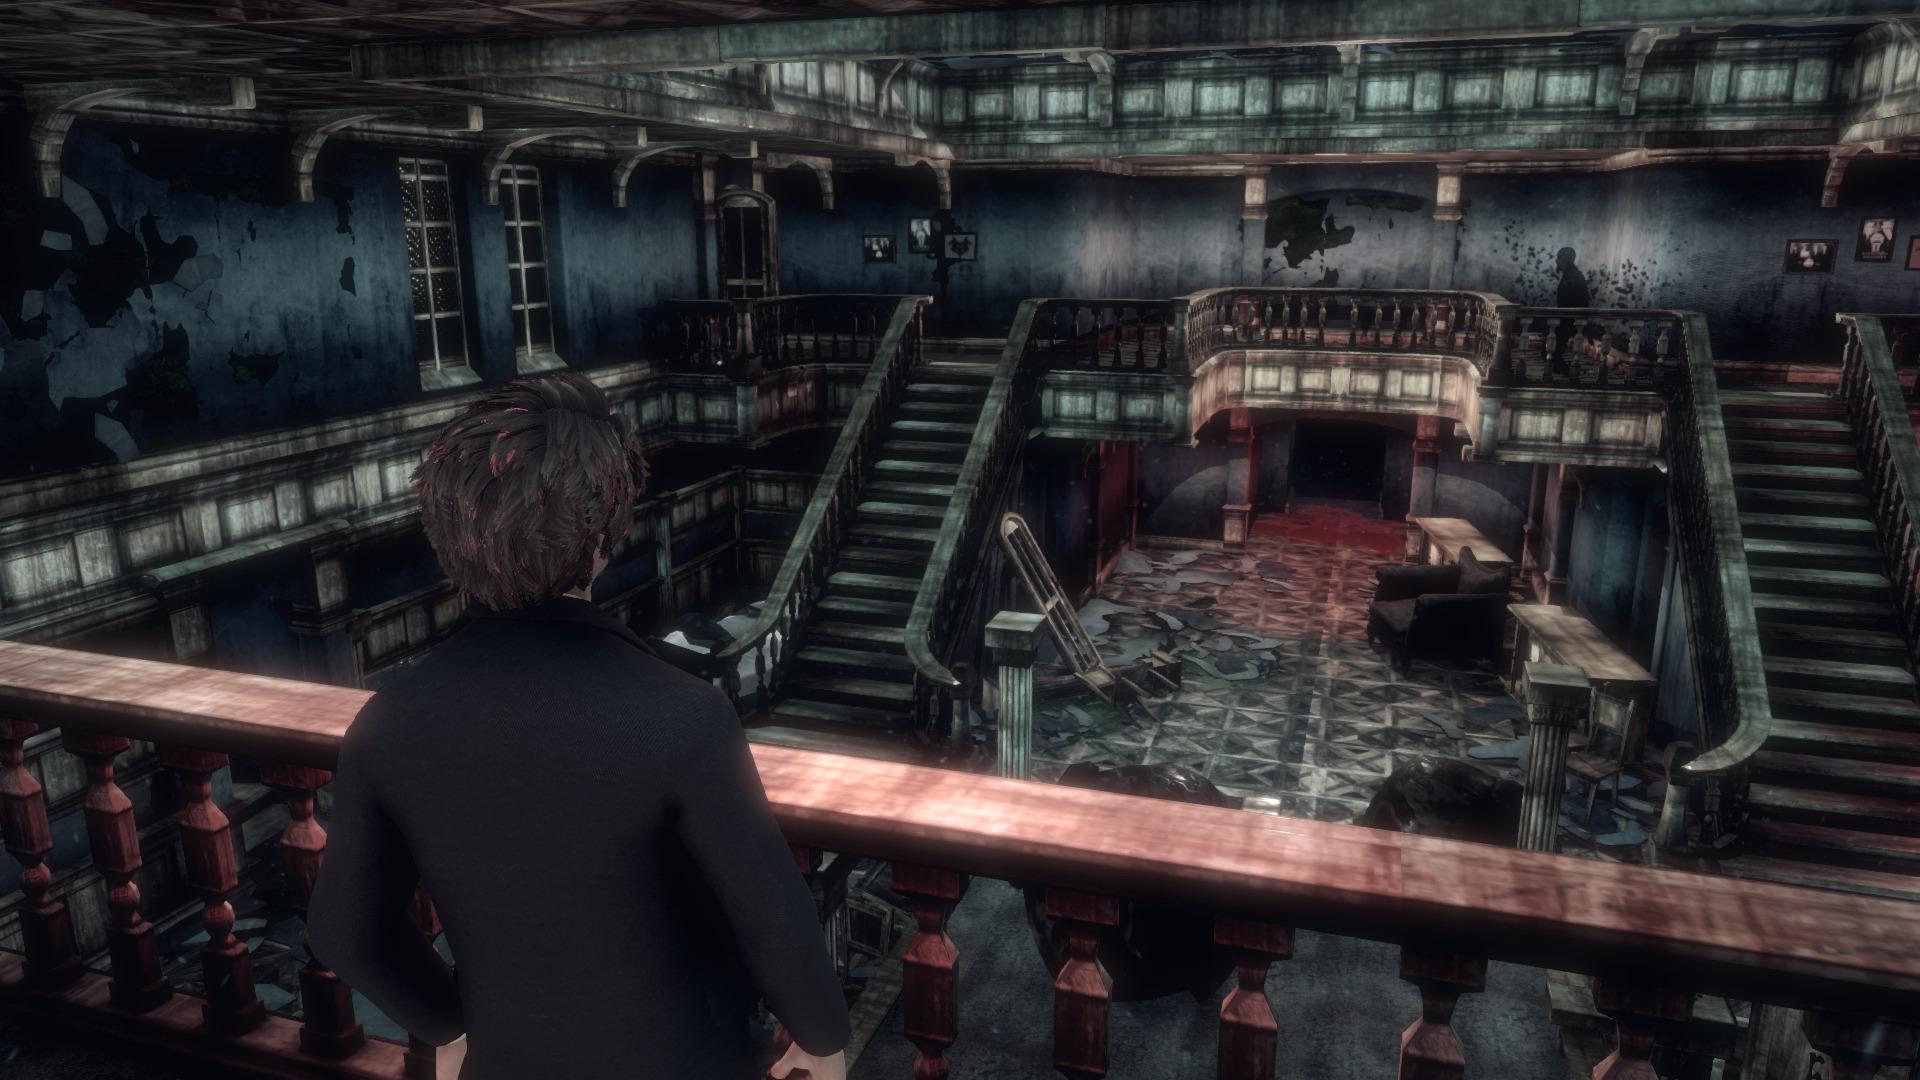 Представлен новый трейлер хоррора The Piano. Стала известна дата релиза